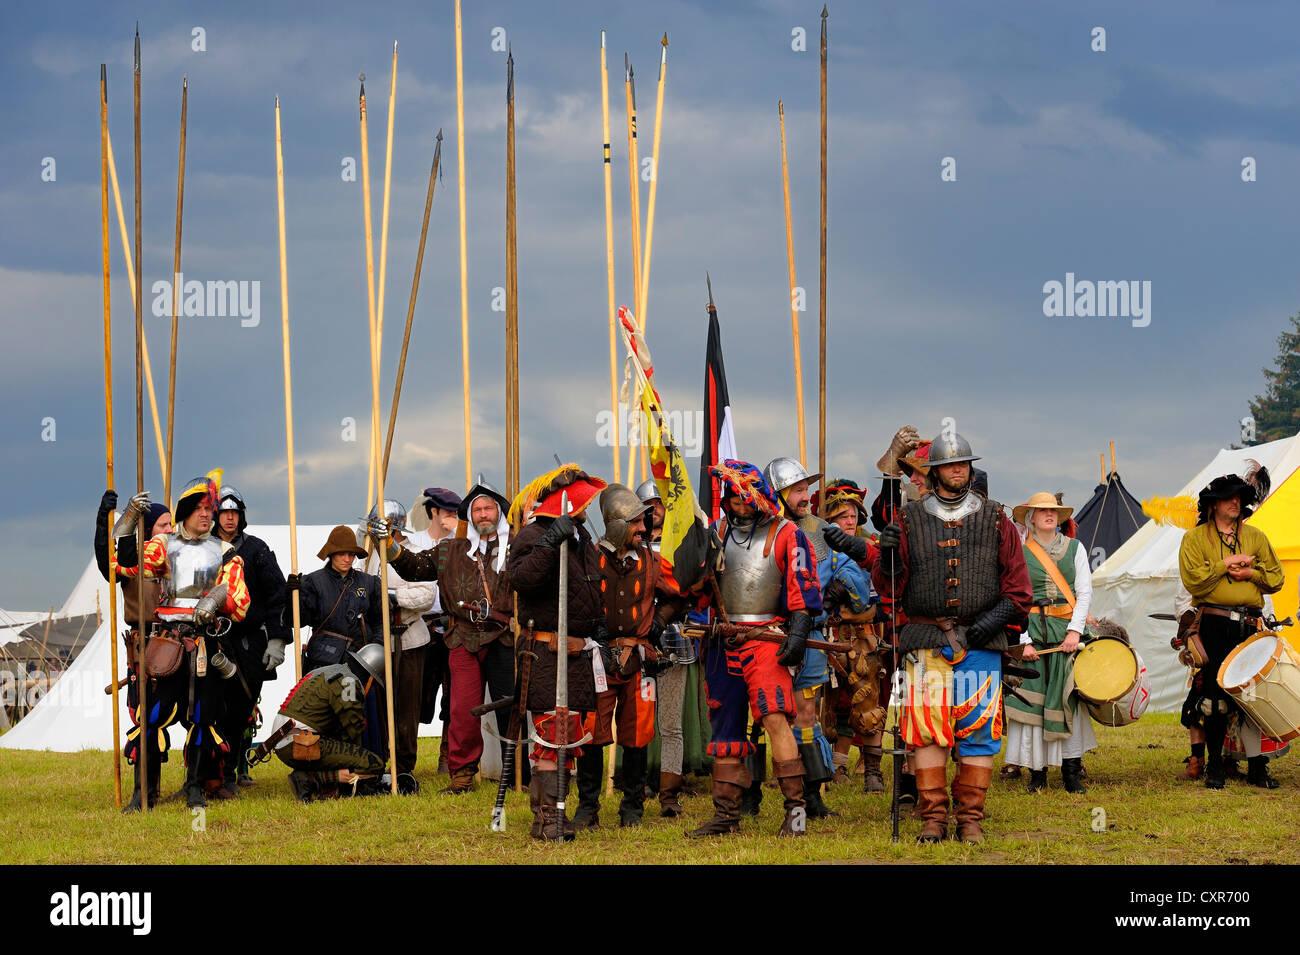 Lansquenets, foot soldiers, historical re-enactment, Landsknecht Hurra 2012, Mittelberg, Upper Allgaeu, Swabia, - Stock Image